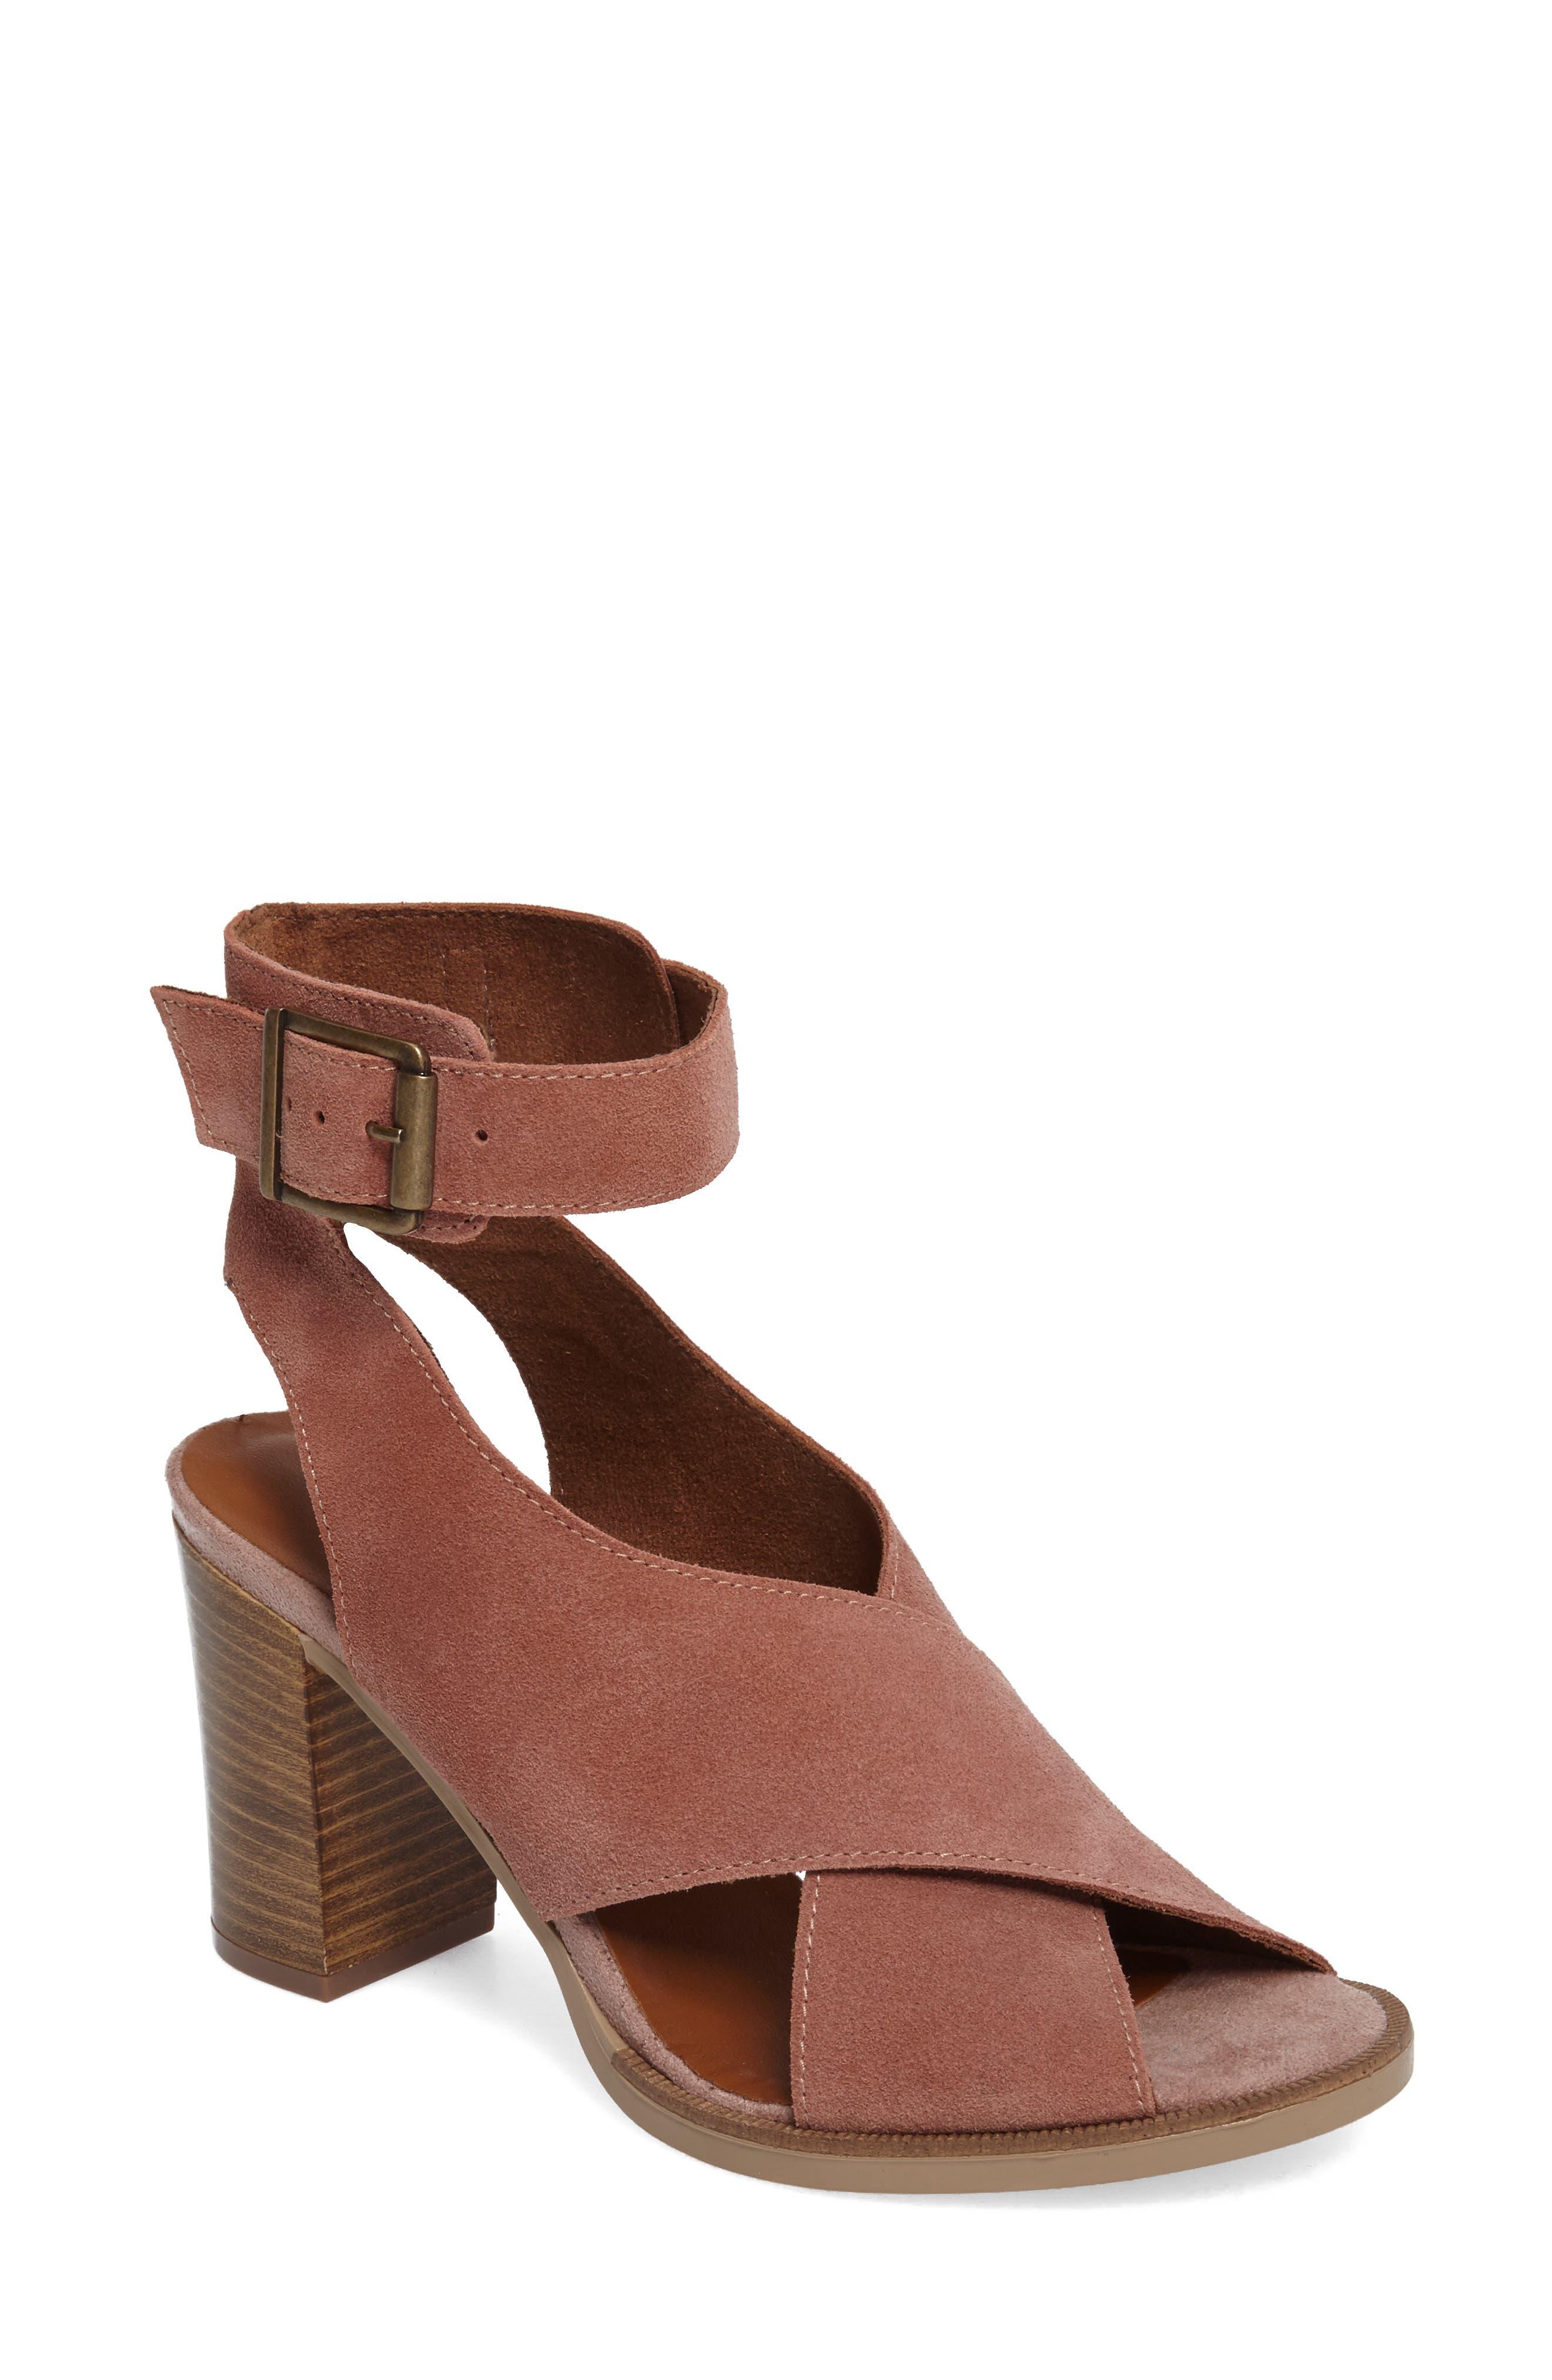 Alternate Image 1 Selected - Bella Vita Lil Ankle Wrap Sandal (Women)